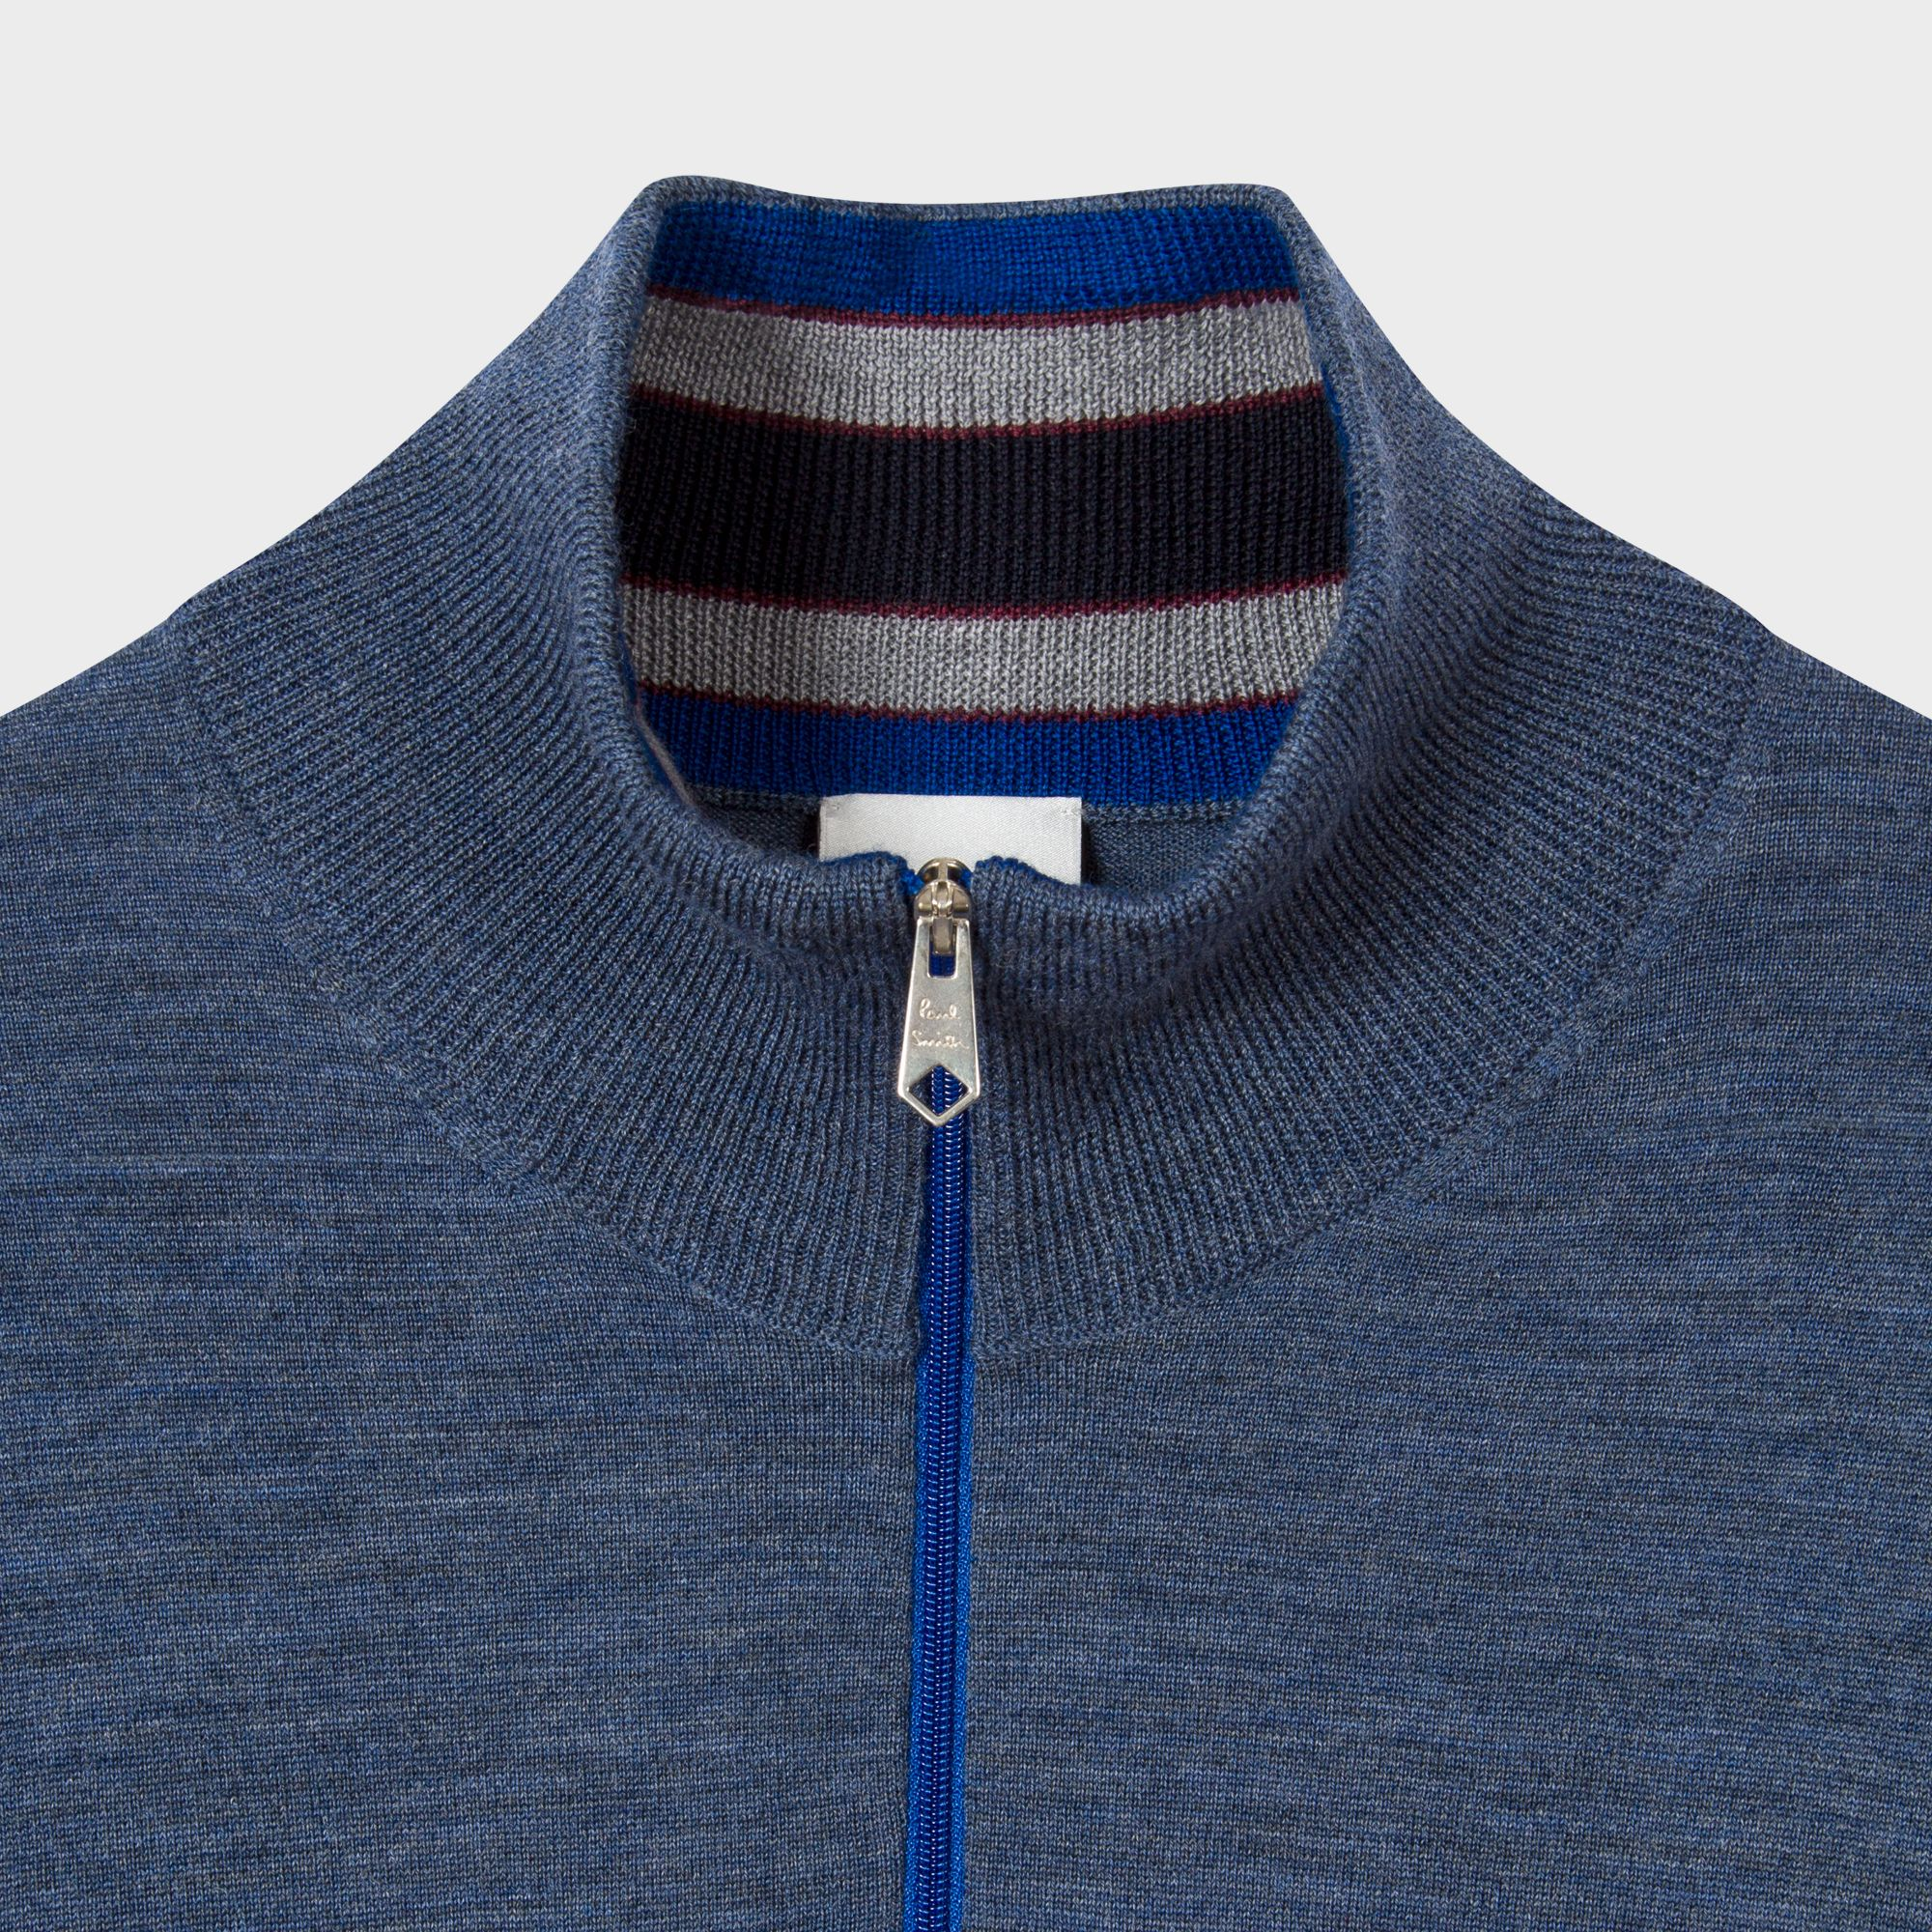 d87cf0e460a31c Paul Smith | Men's Blue-Marl Merino Wool Funnel Neck Sweater | The ...